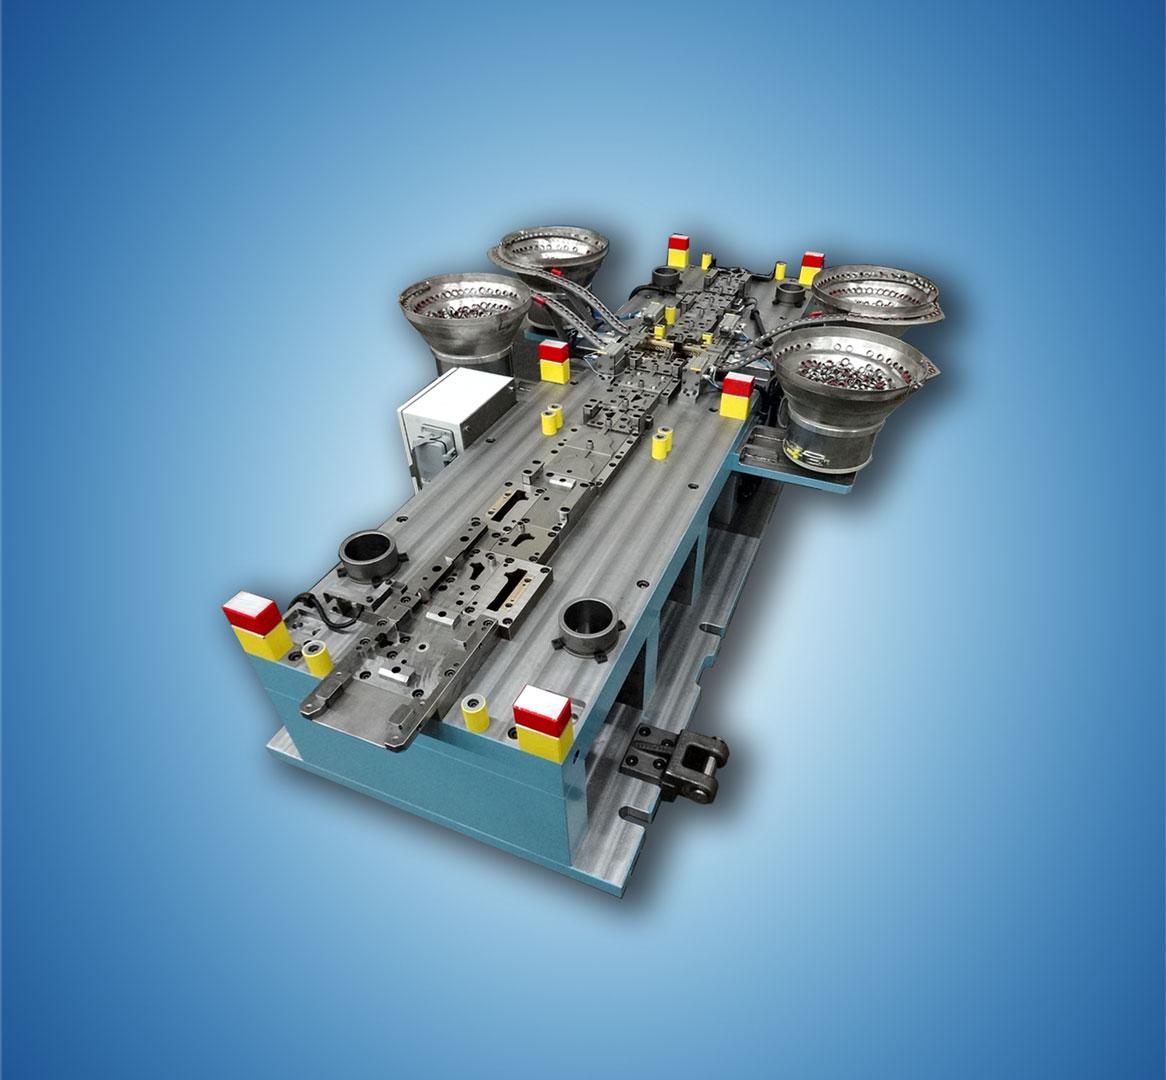 Ero-Projekt-d.o.o.-Toolshop-Werkzeugbau-4-Orodje-za-preoblikov--plocevine-_-slika-2